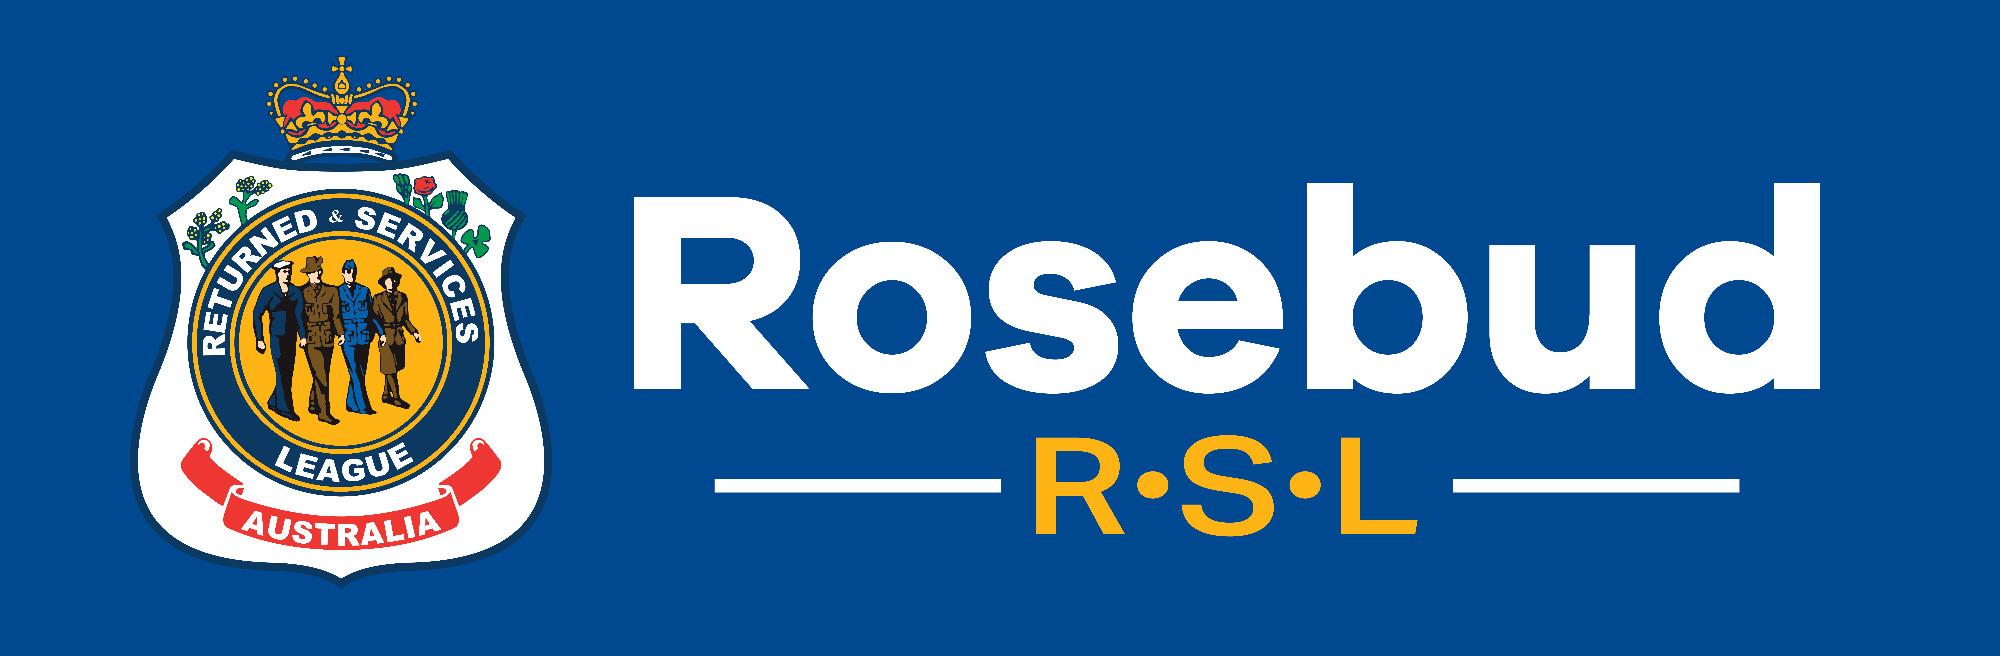 Rosebud RSL Sub Branch